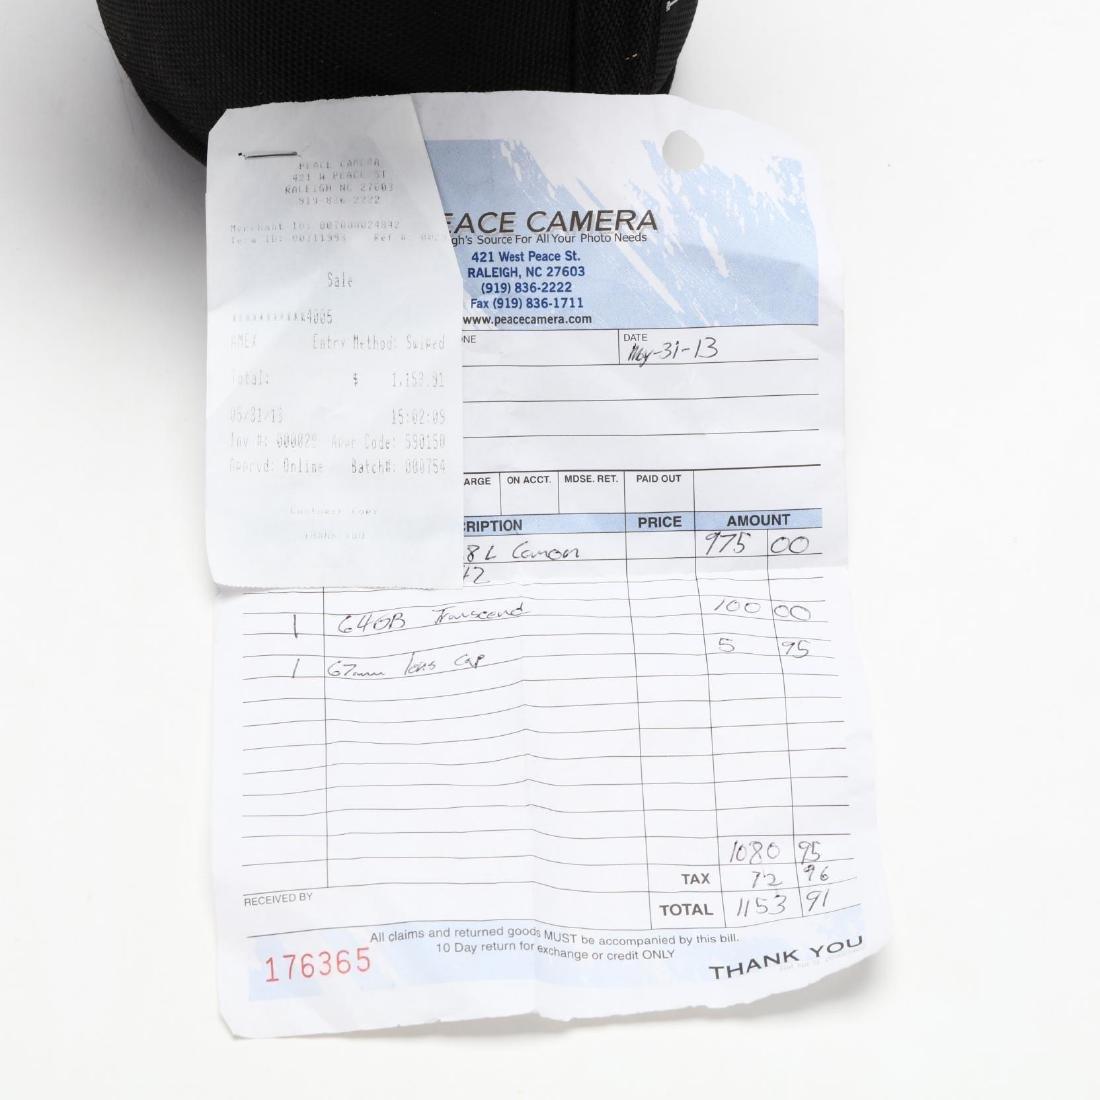 Canon 70-200mm Camera Lens - 6